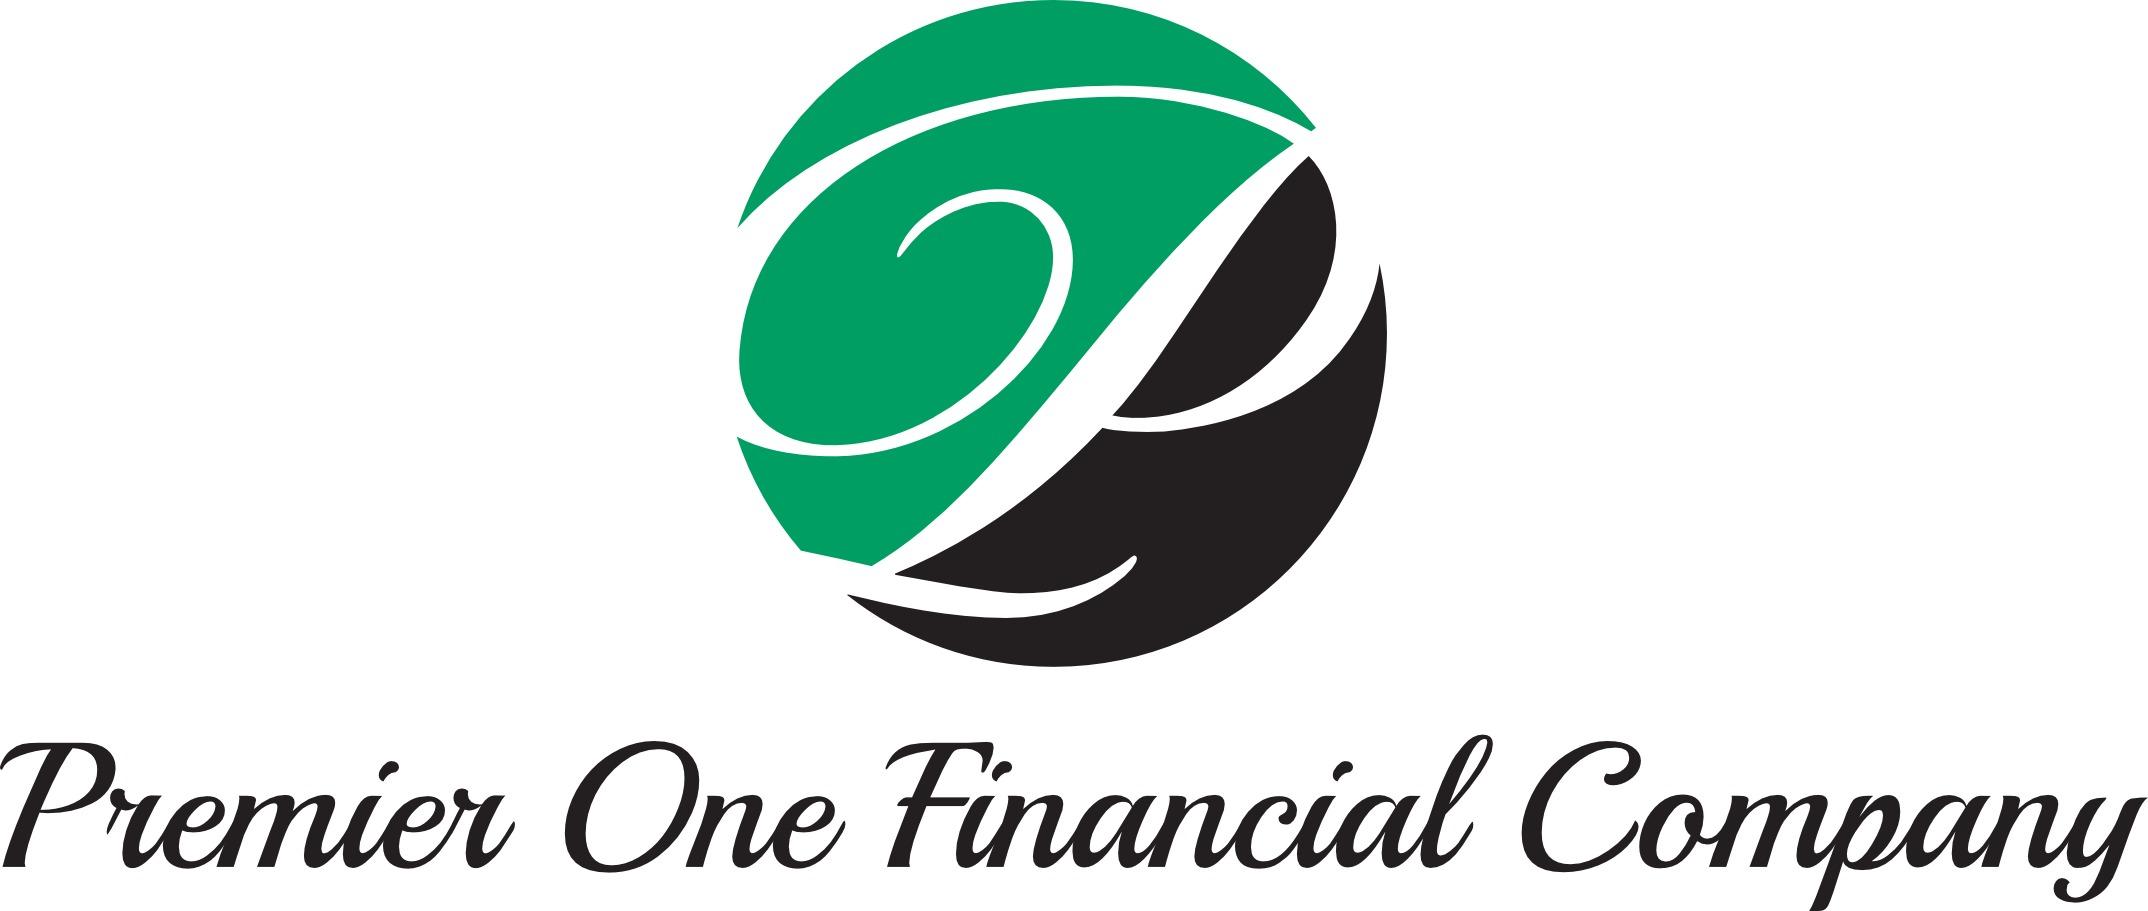 Premier One logo